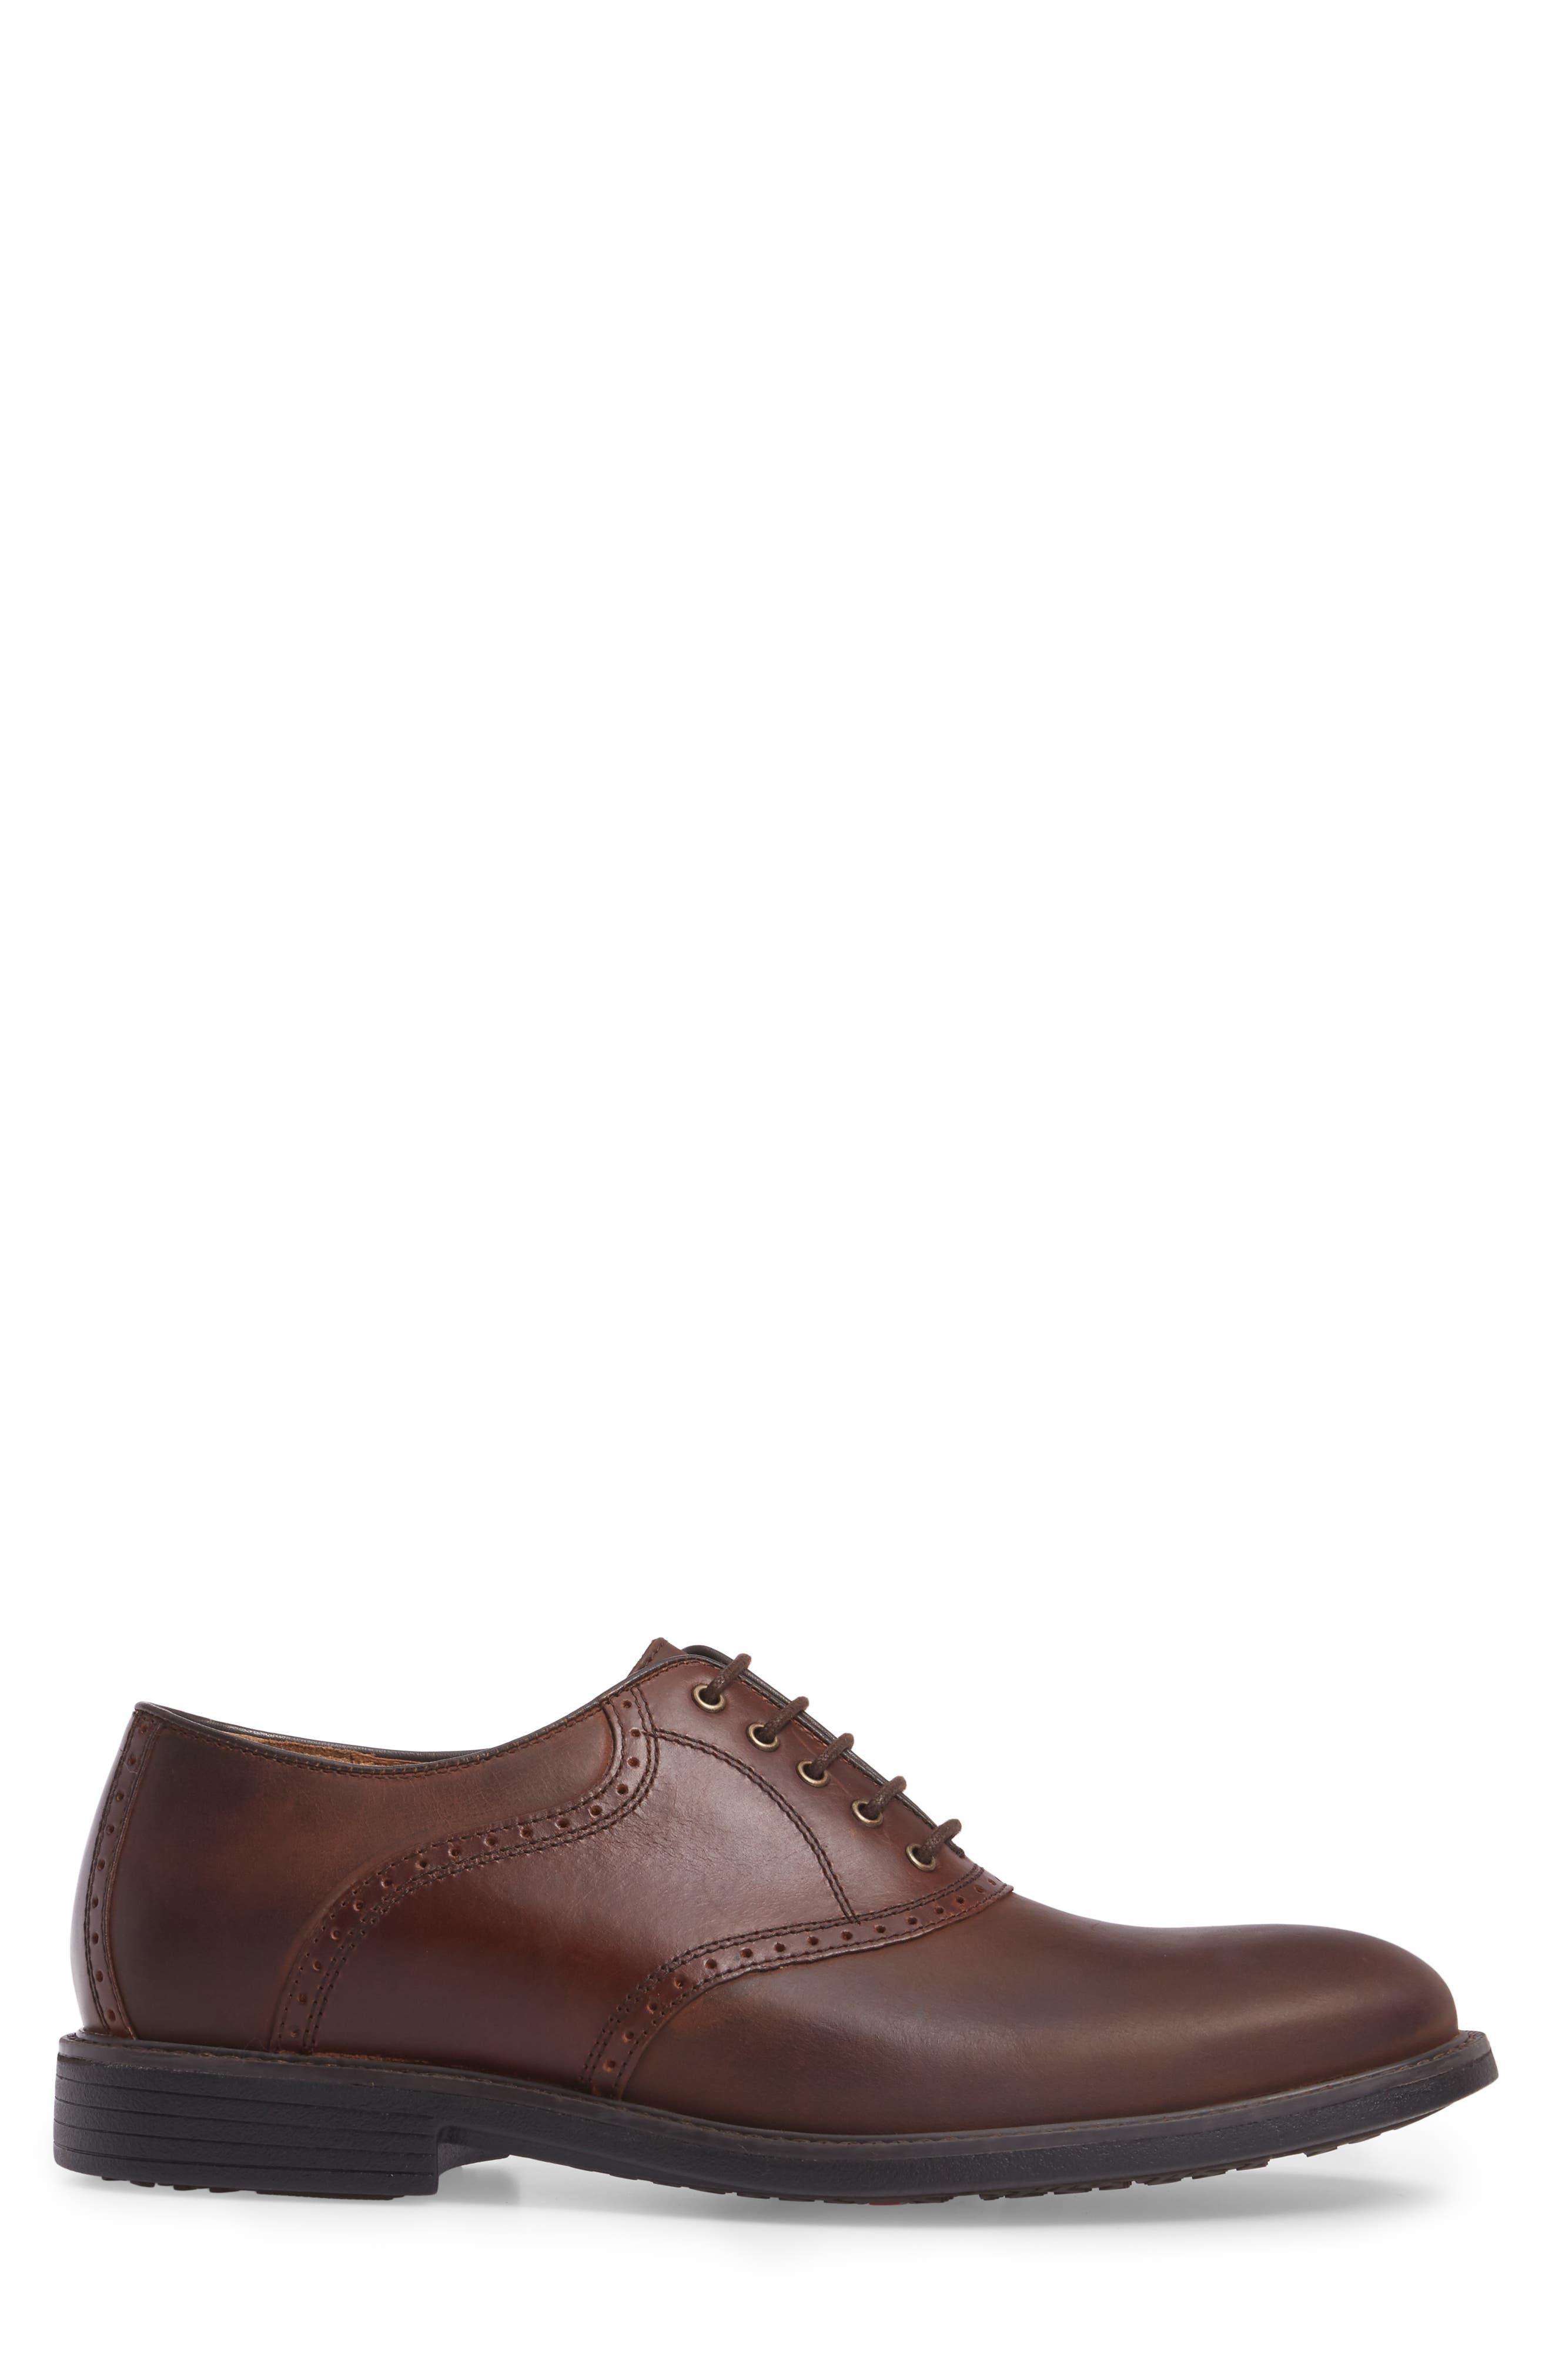 Hollis Waterproof Plain Toe Oxford,                             Alternate thumbnail 3, color,                             Brown